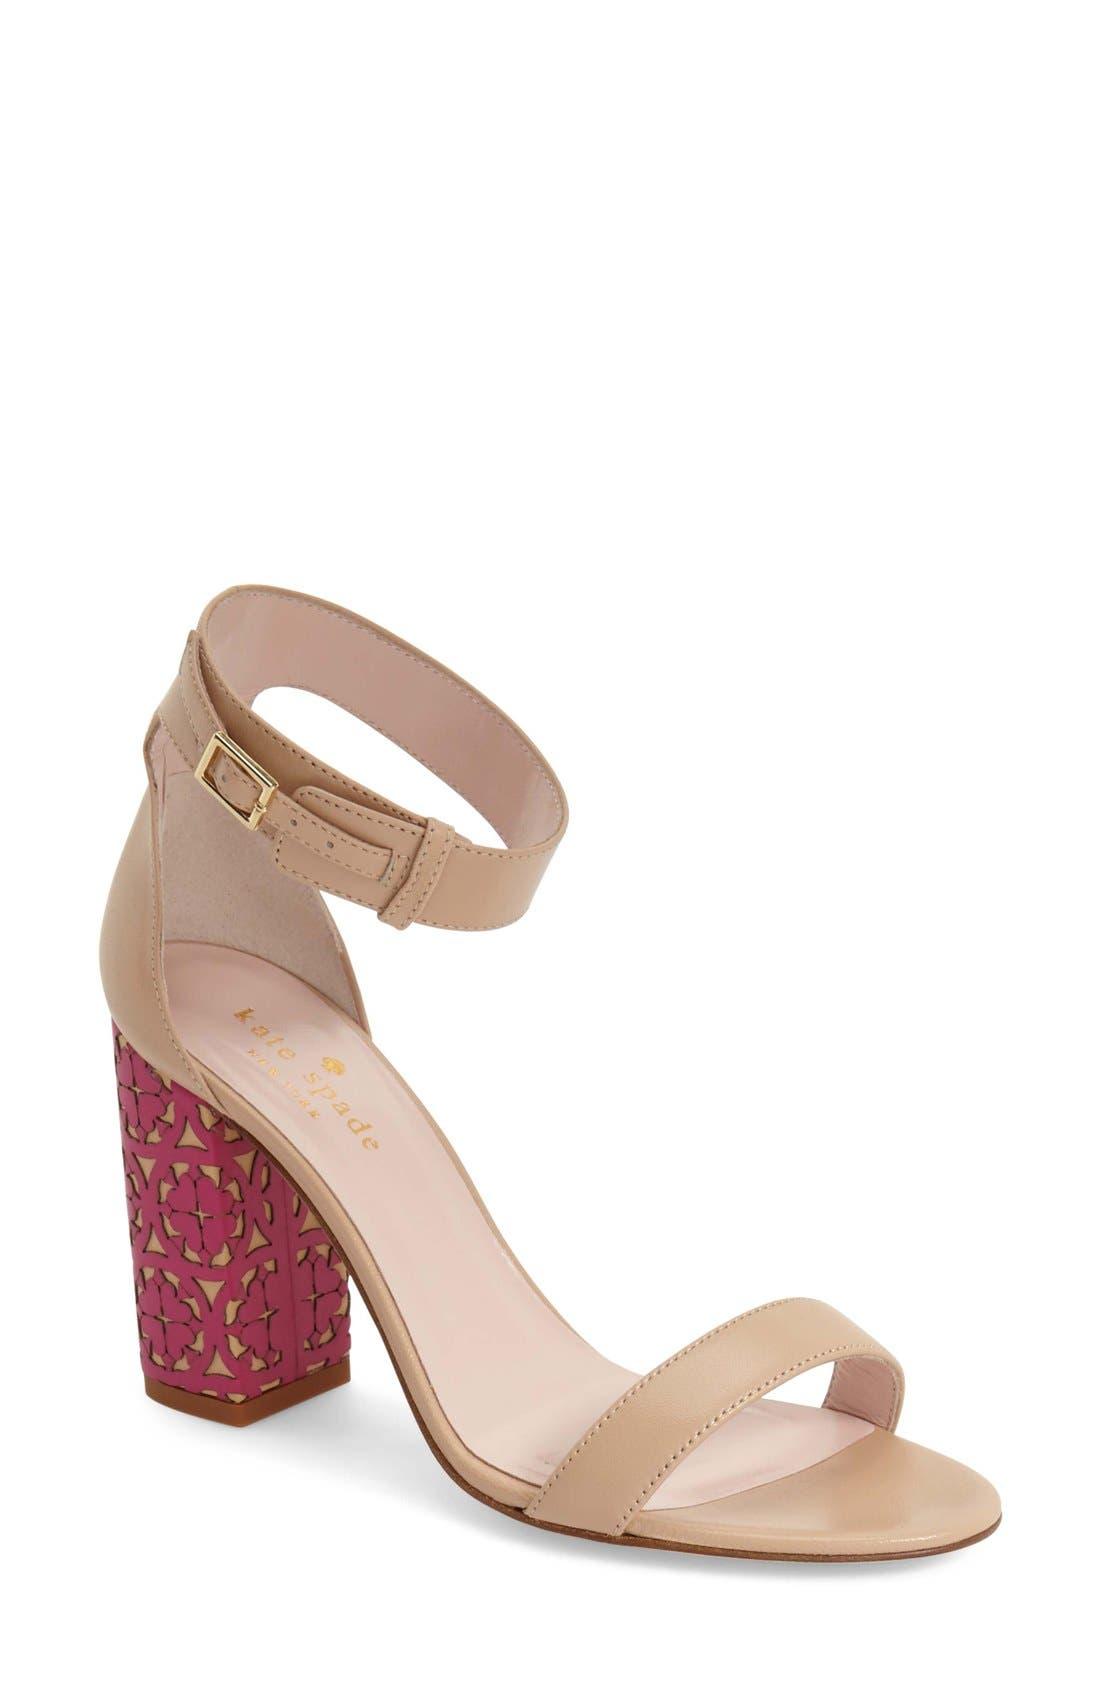 Main Image - kate spade new york 'idelle' ankle strap block heel sandal (Women)